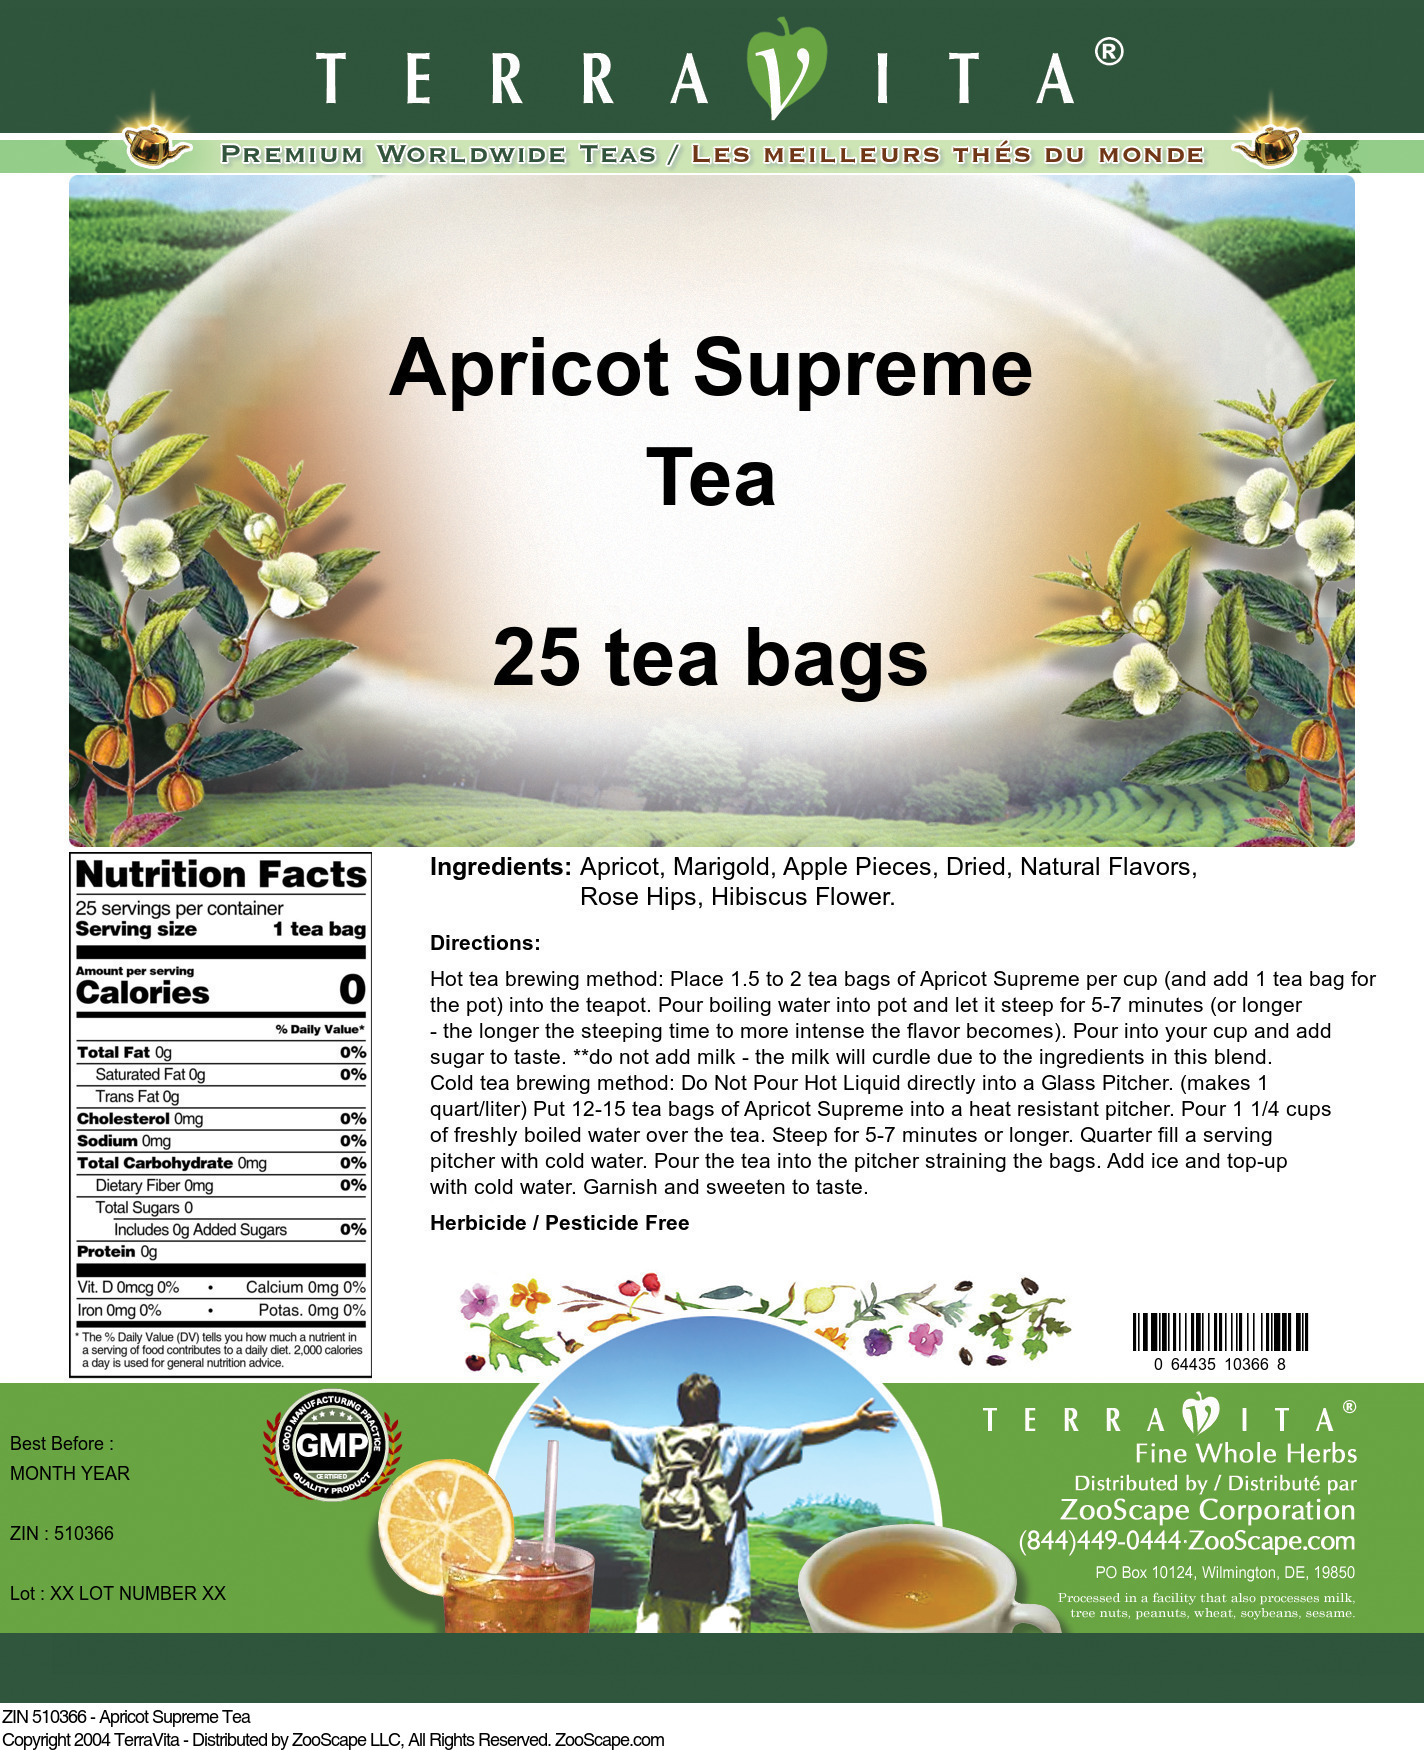 Apricot Supreme Tea